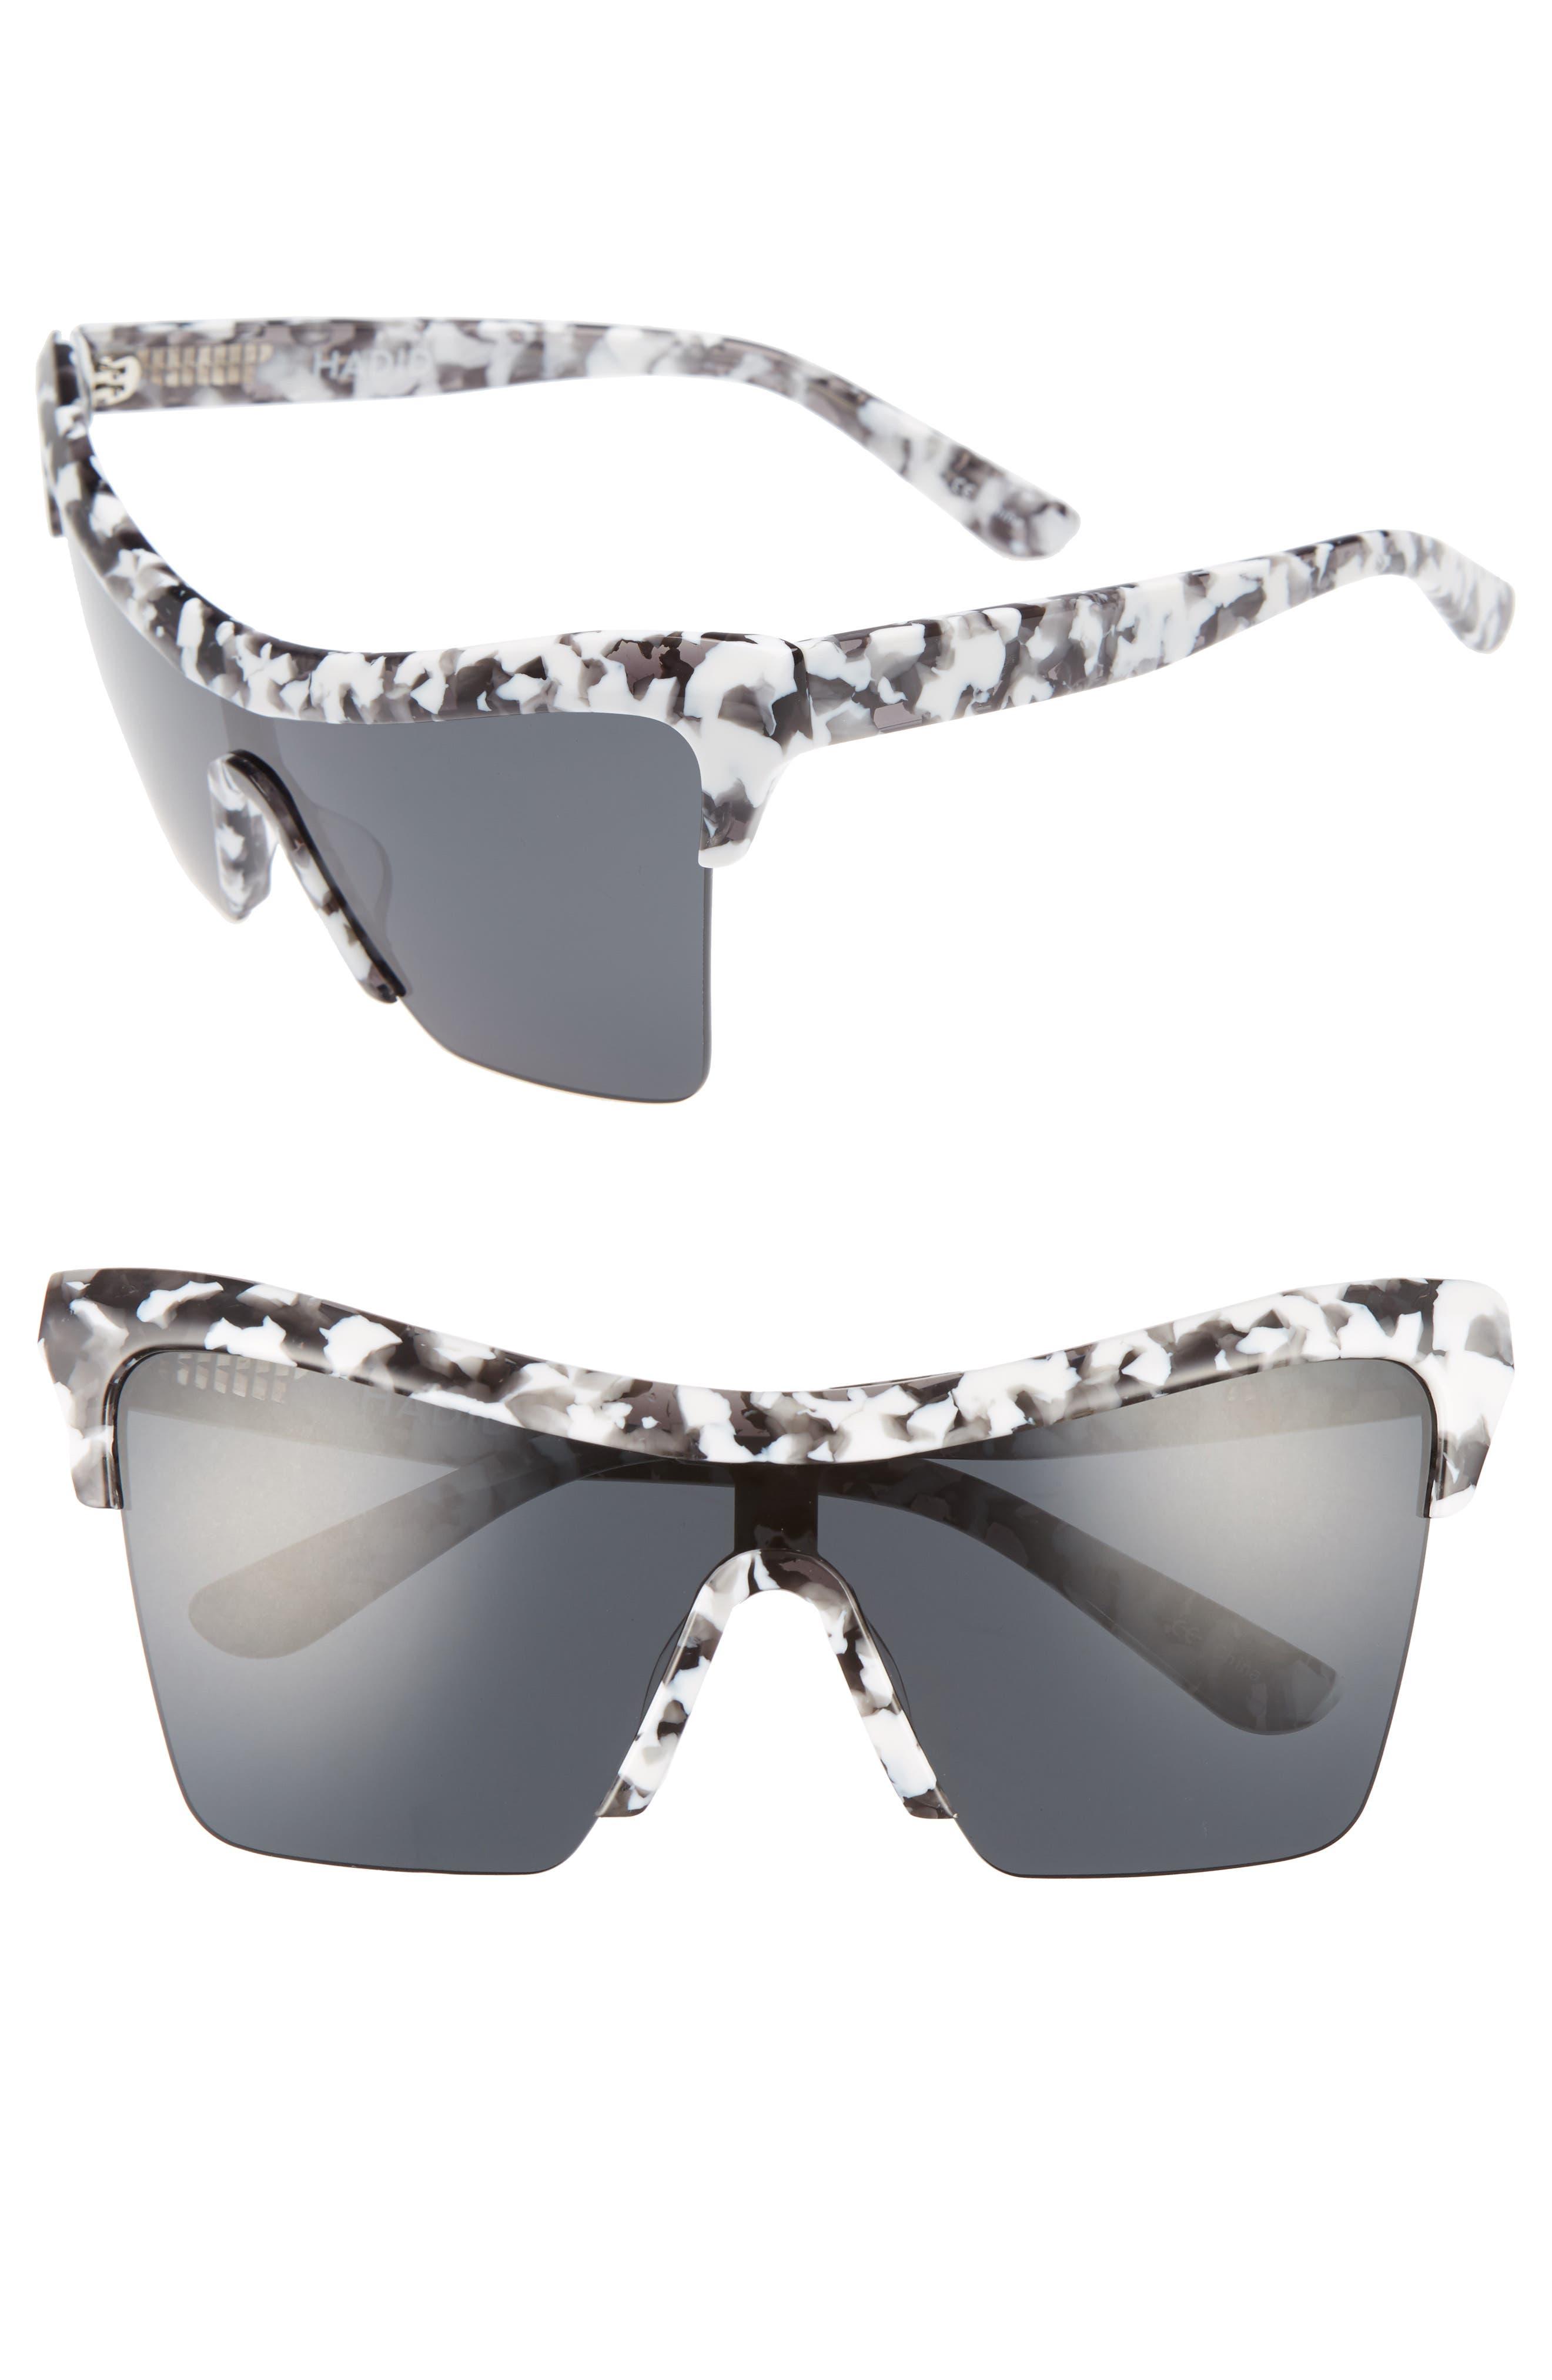 Passport Control 68mm Sunglasses,                             Main thumbnail 1, color,                             WHITE CAMO